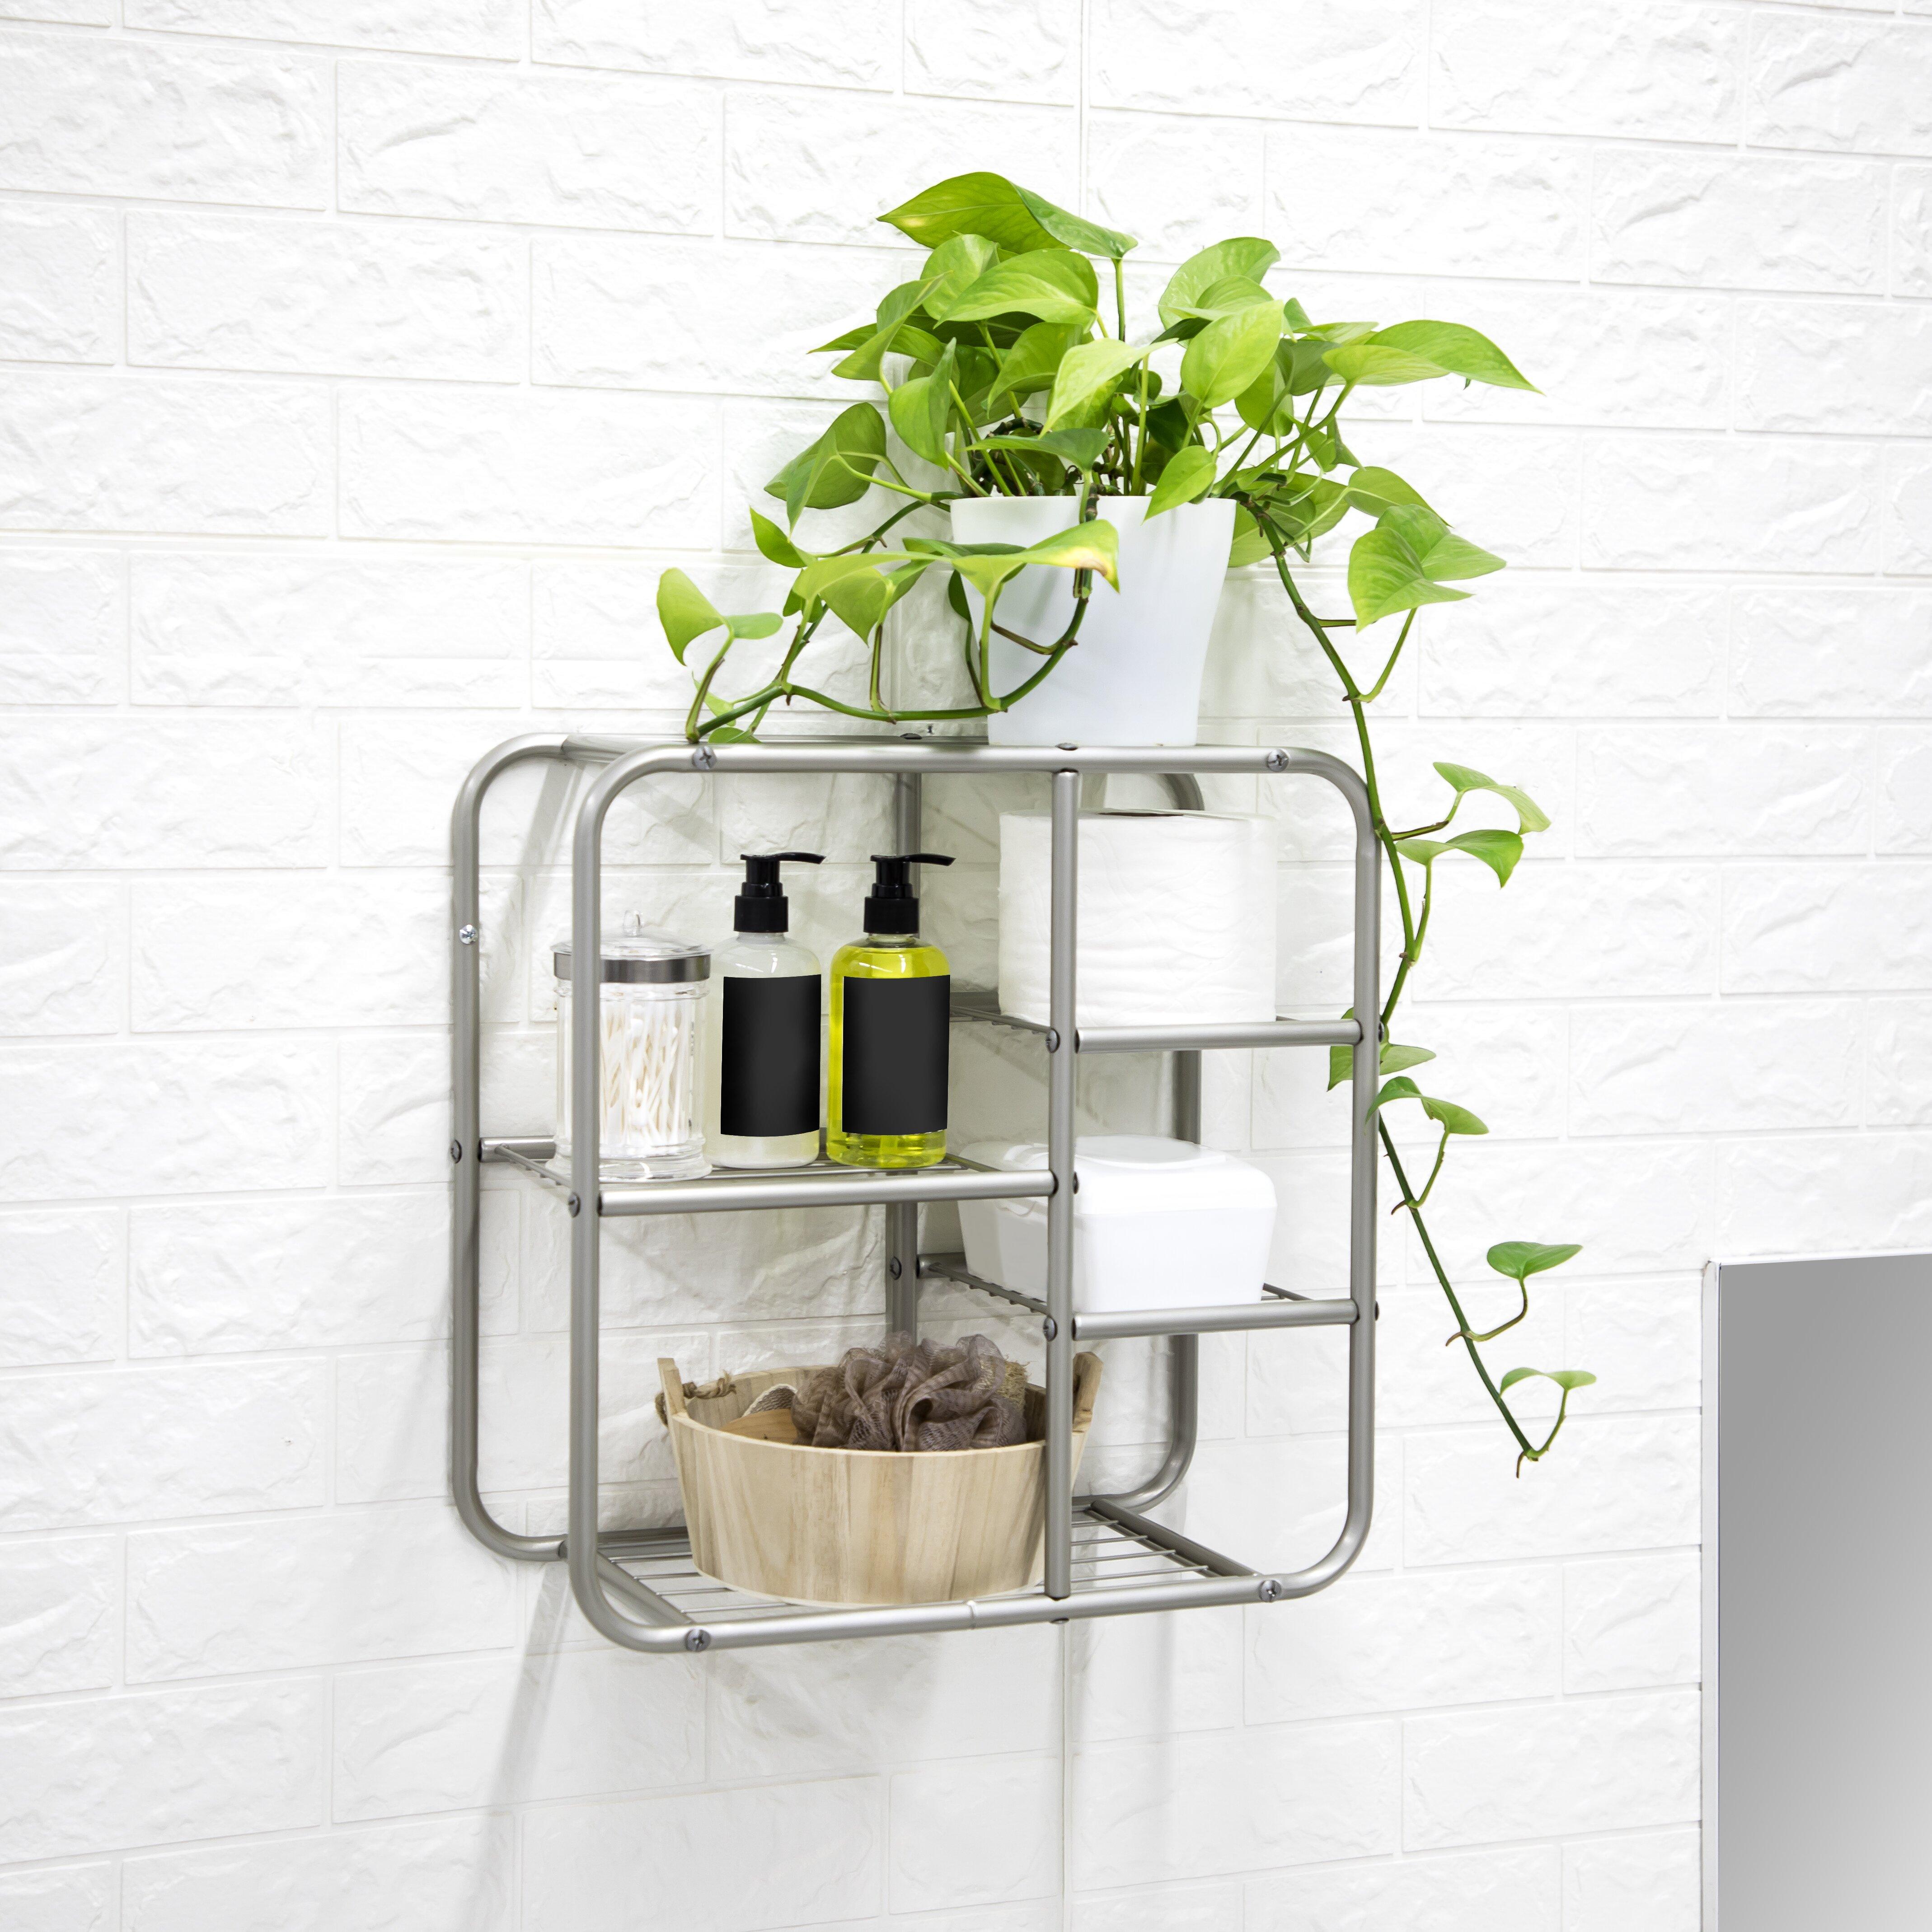 Rebrilliant Skiba 8 W X 16 14 H X 6 14 D Wall Mounted Bathroom Shelves Reviews Wayfair